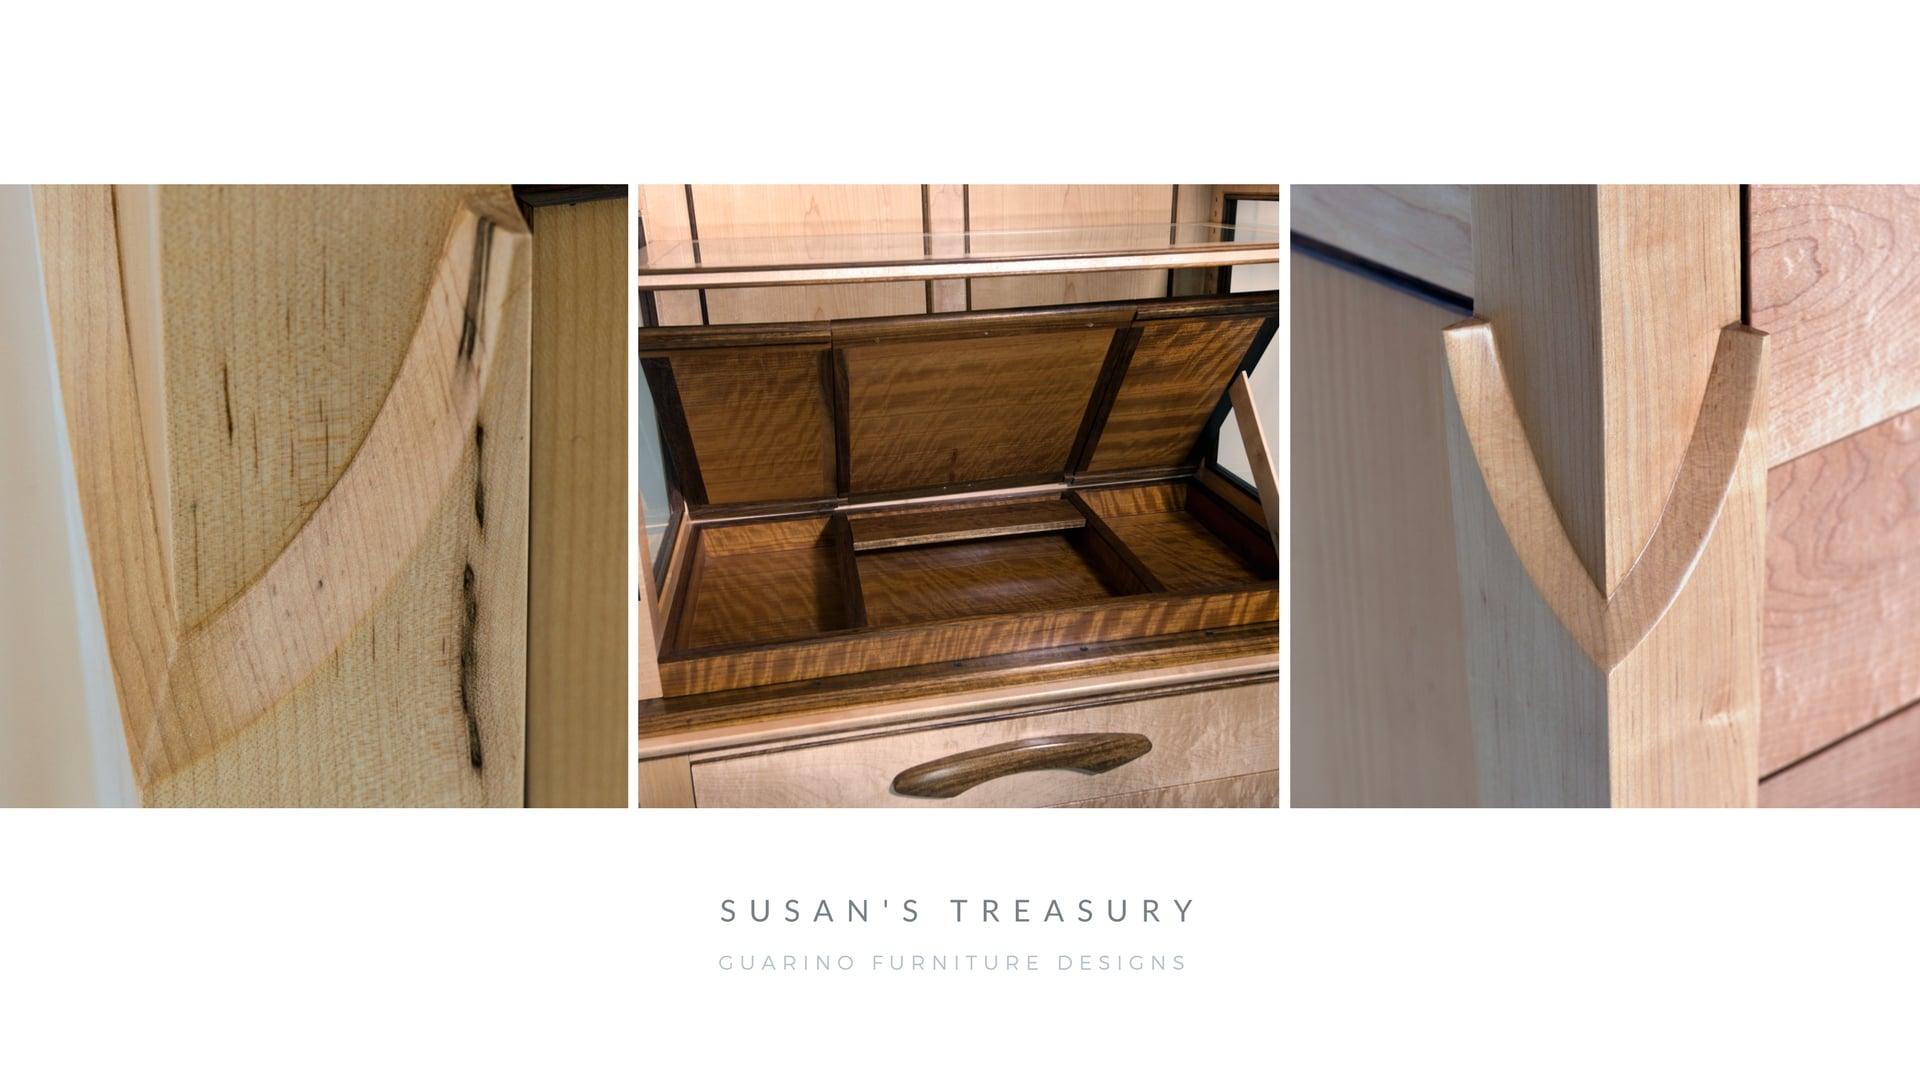 Guarino Furniture Designs Susans Treasury post